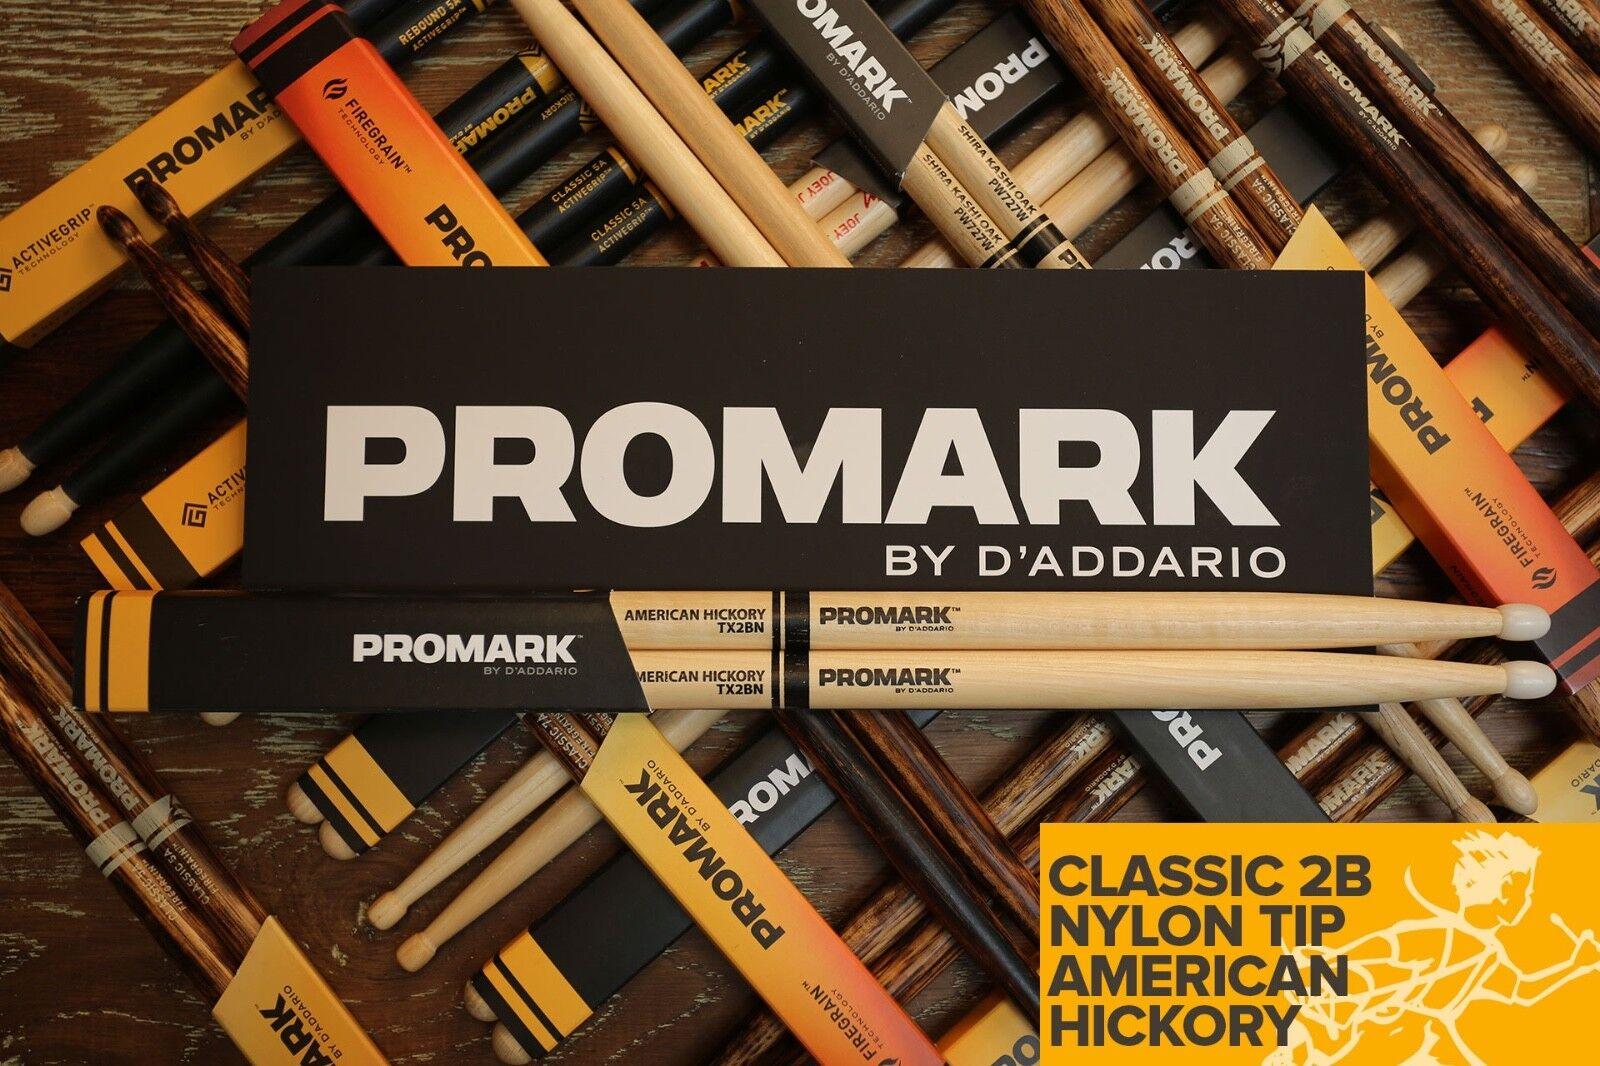 Promark Hickory 2B Nylon Tip Drum Sticks Brick of 6